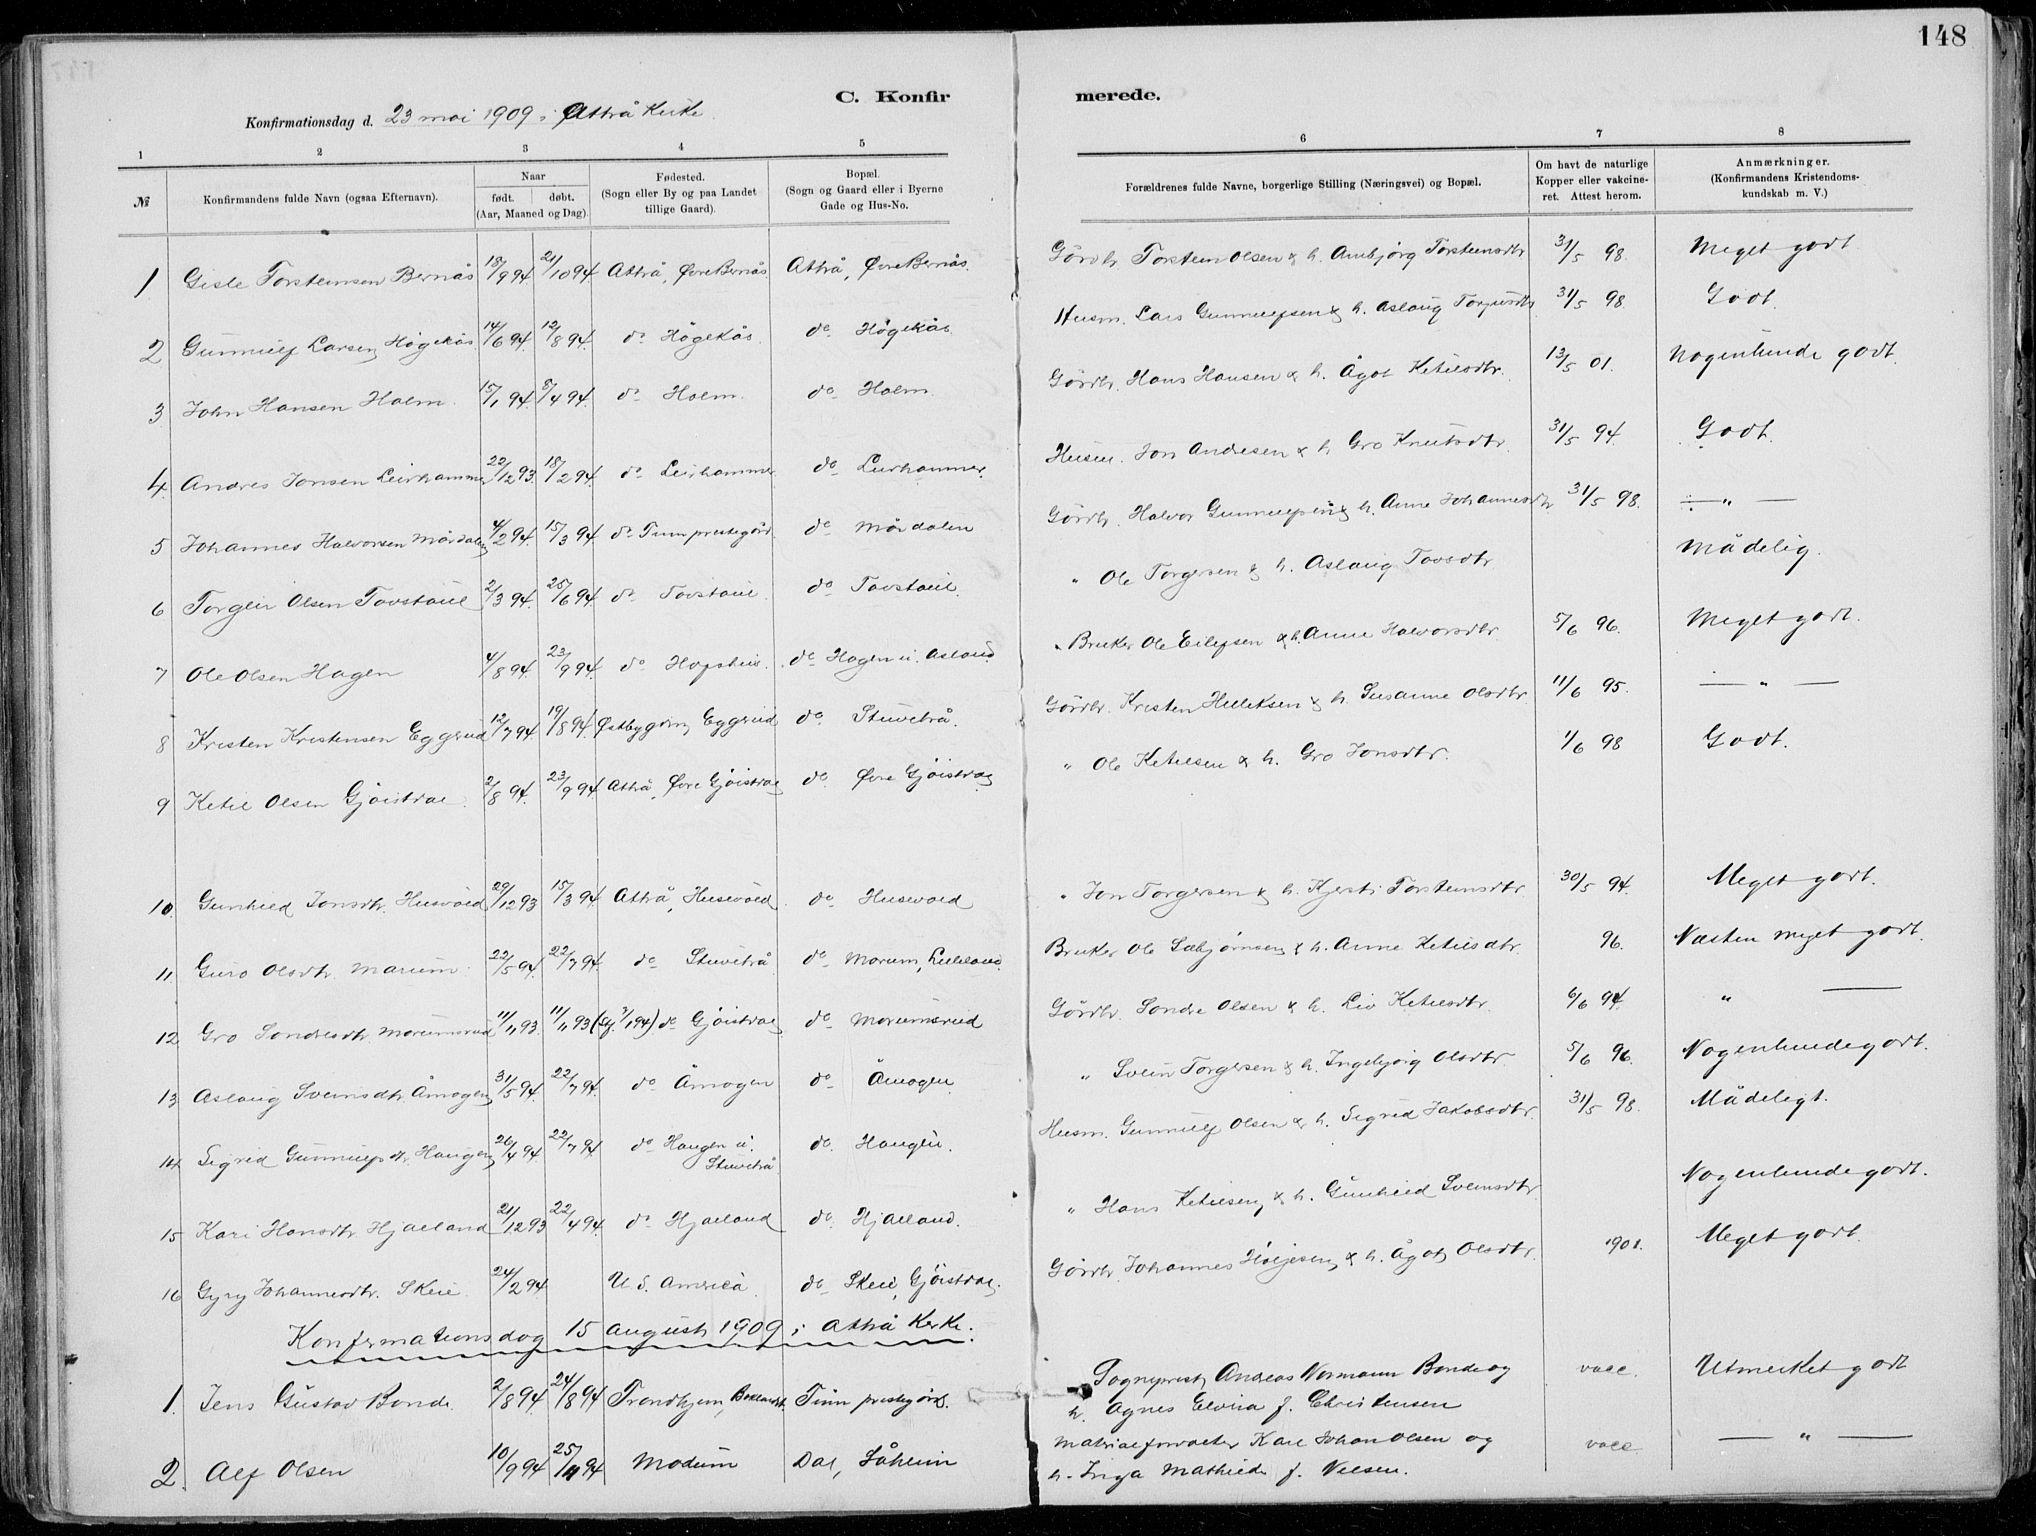 SAKO, Tinn kirkebøker, F/Fa/L0007: Ministerialbok nr. I 7, 1878-1922, s. 148